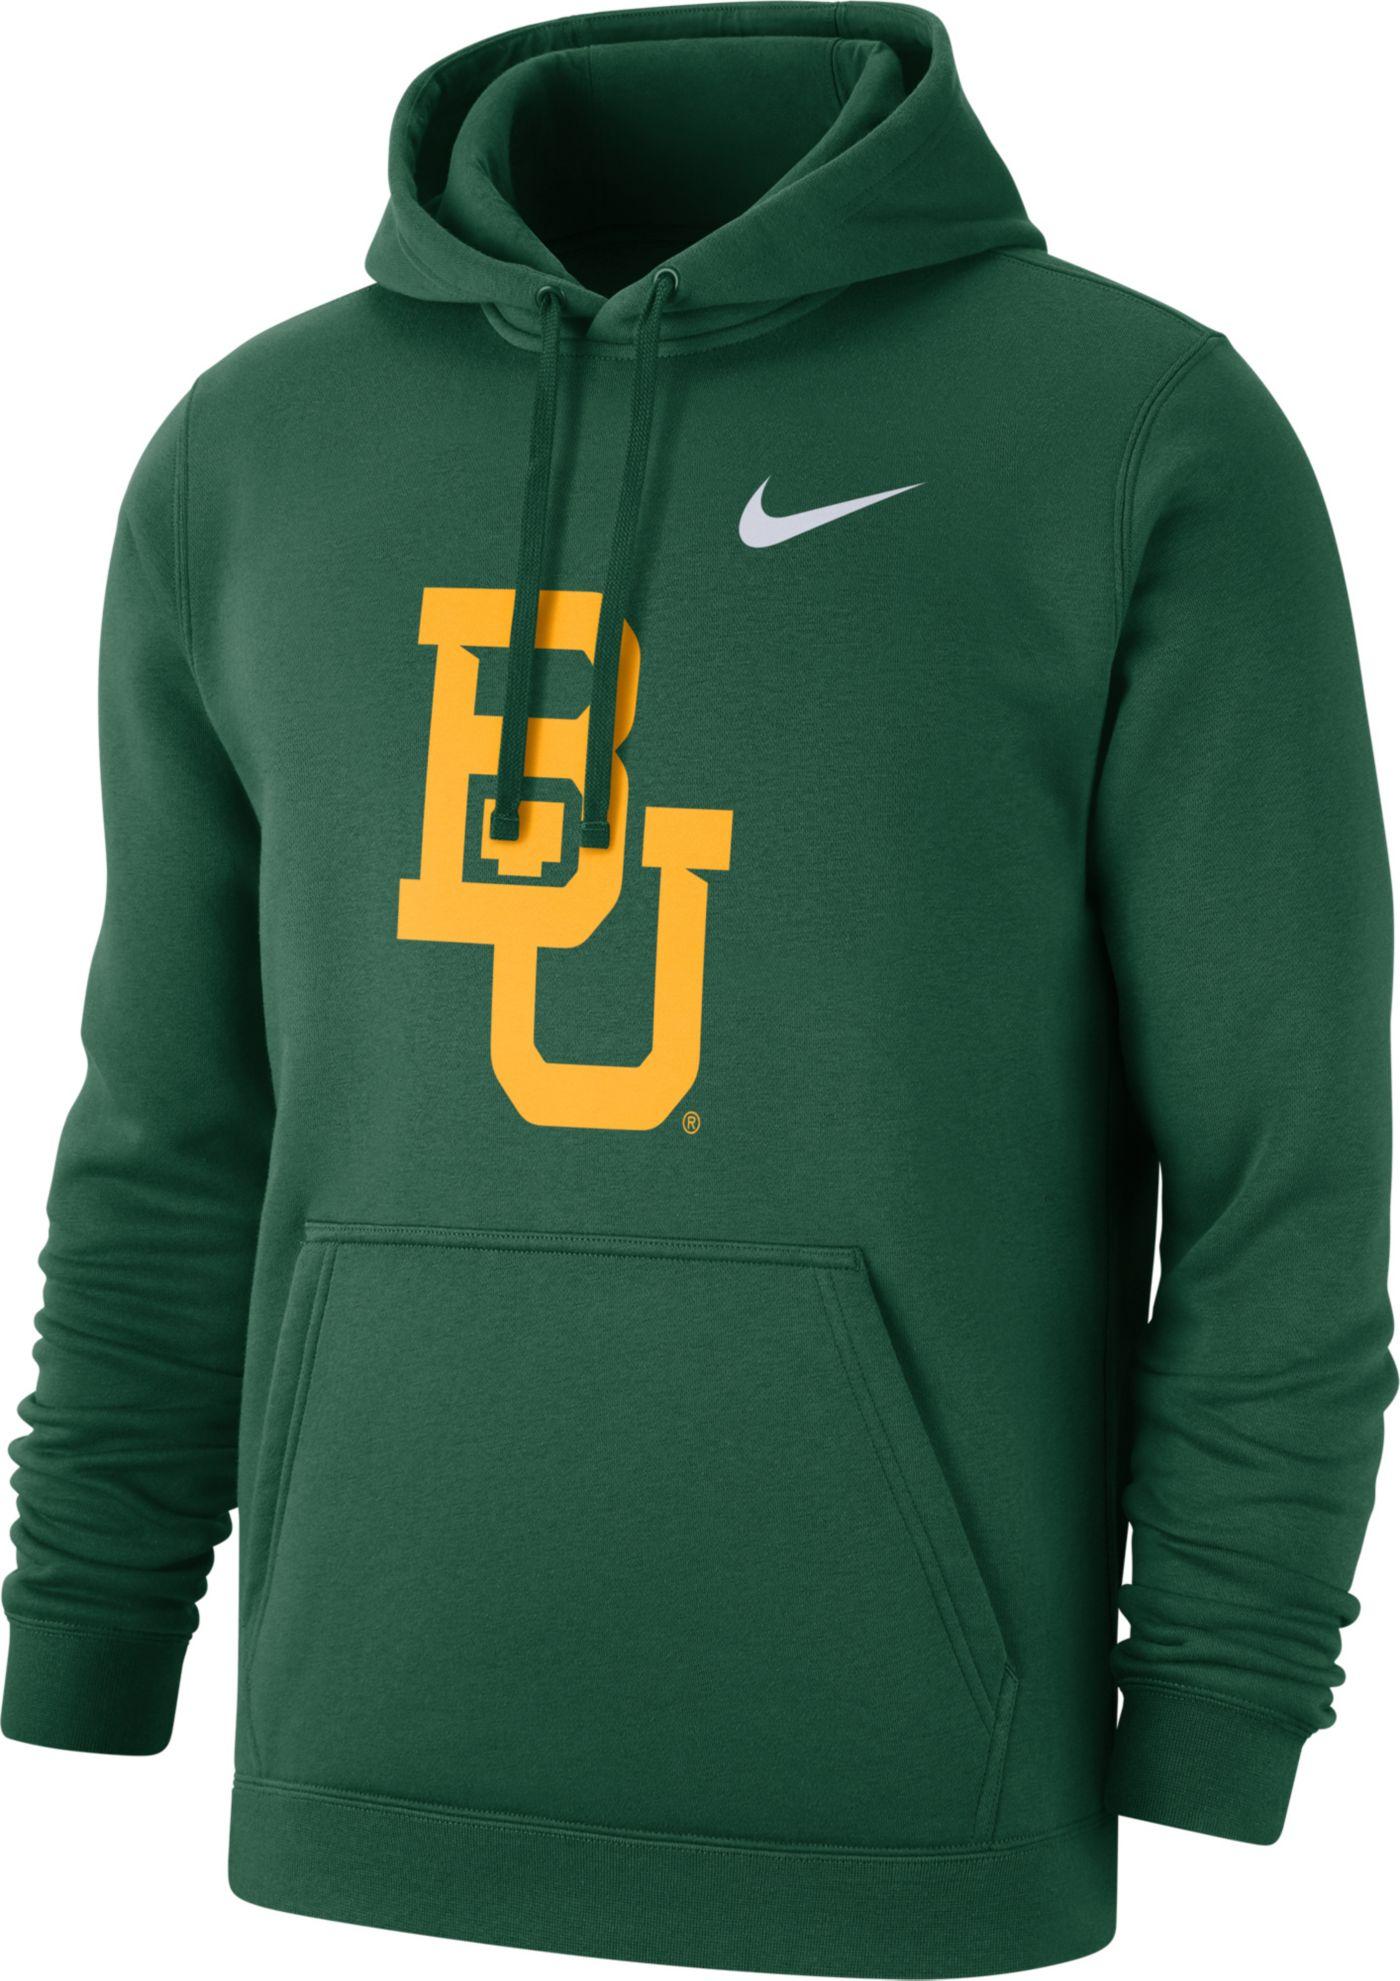 Nike Men's Baylor Bears Green Club Fleece Pullover Hoodie